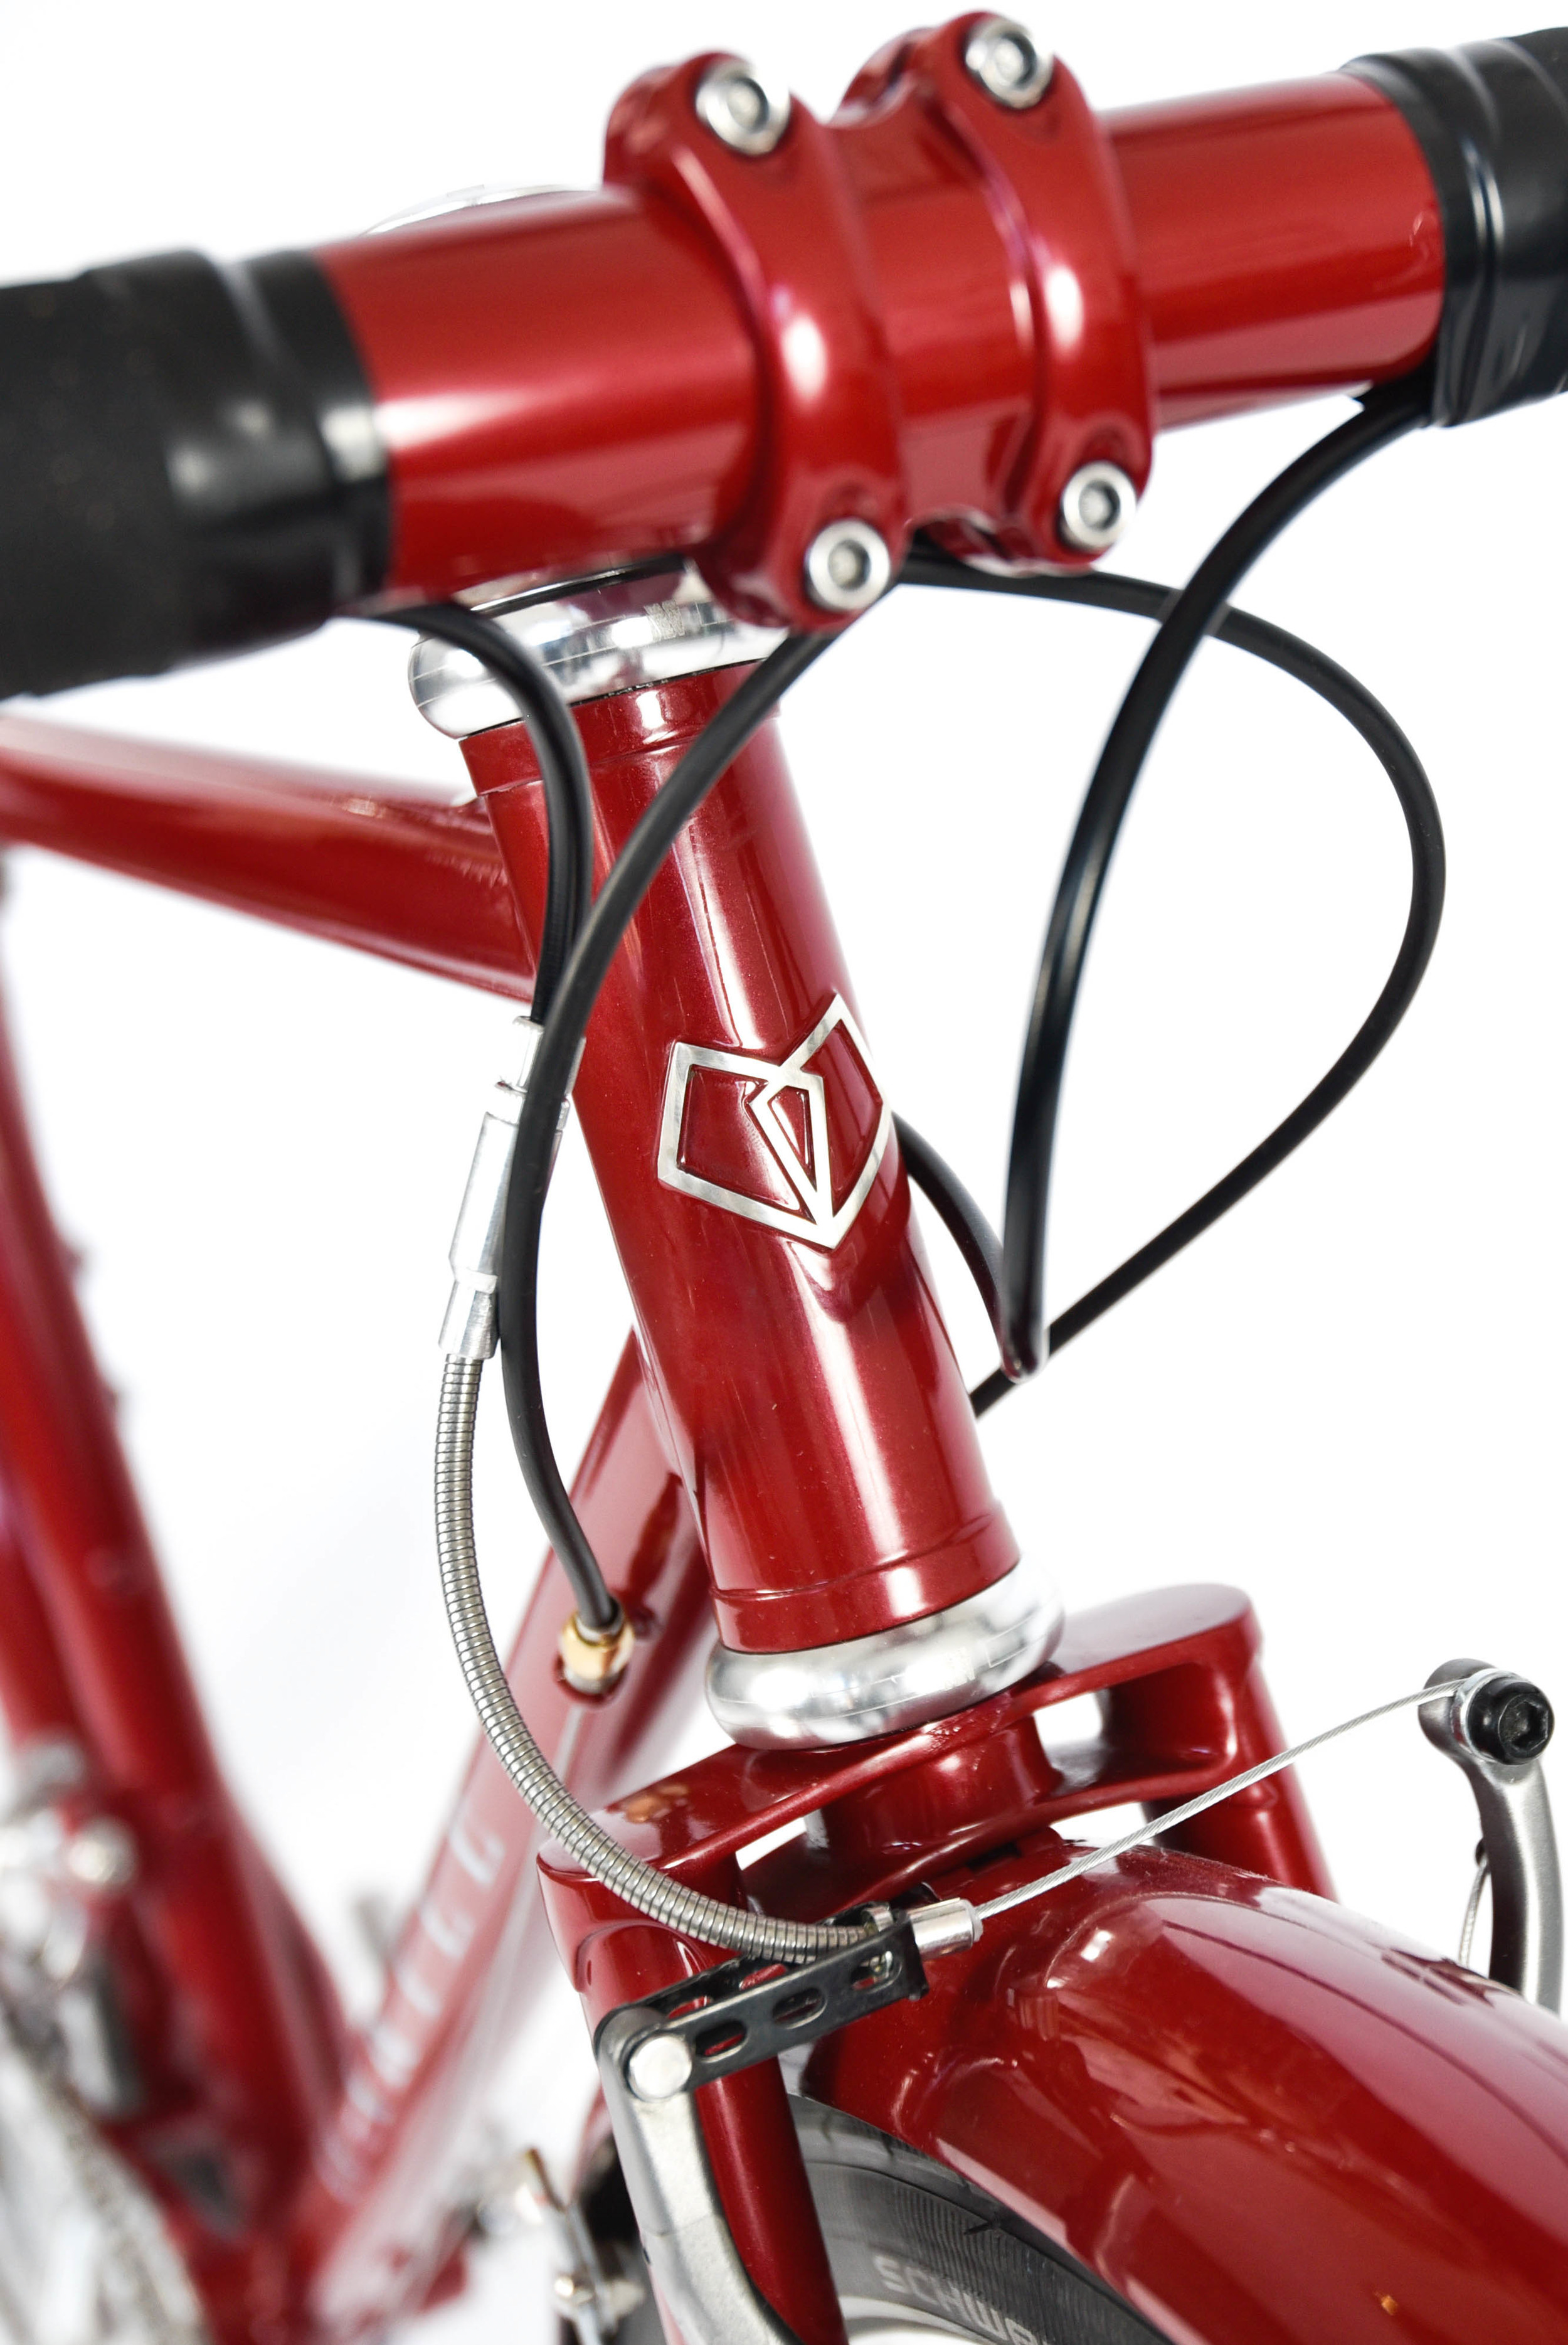 853 mini touring bike headbadge